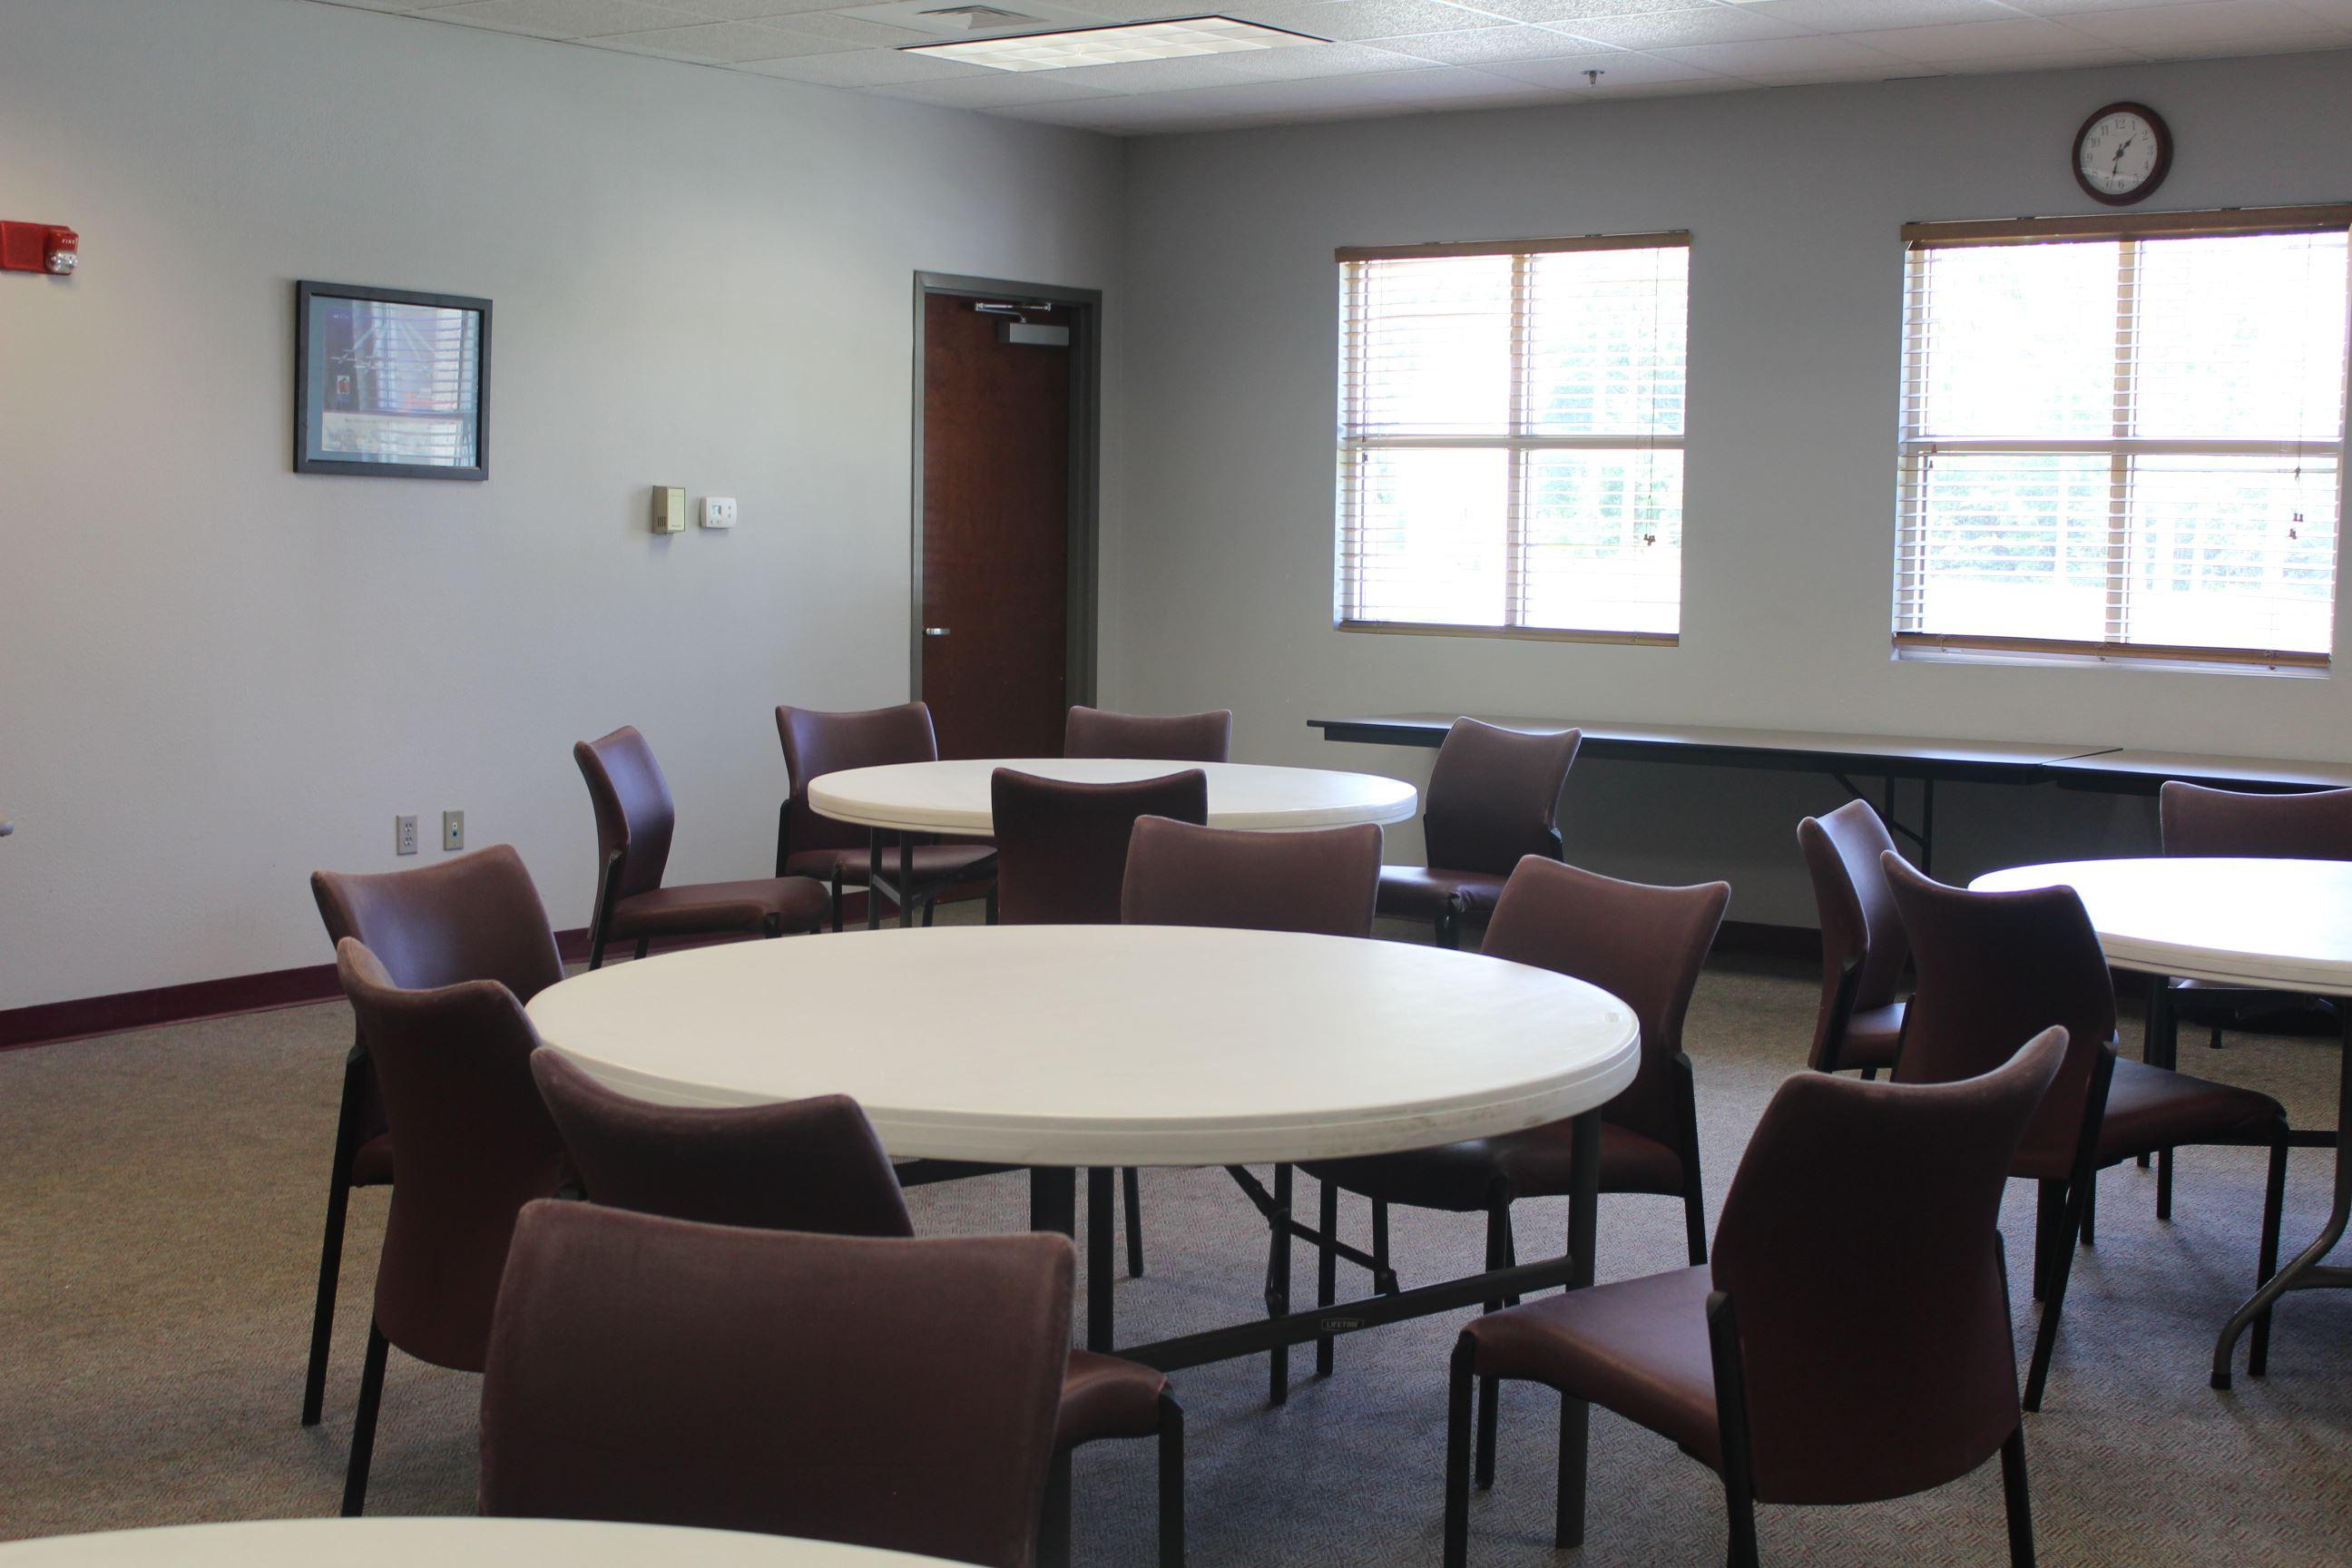 Rent a facility callaway fl official website callaway room usage request pdf altavistaventures Gallery